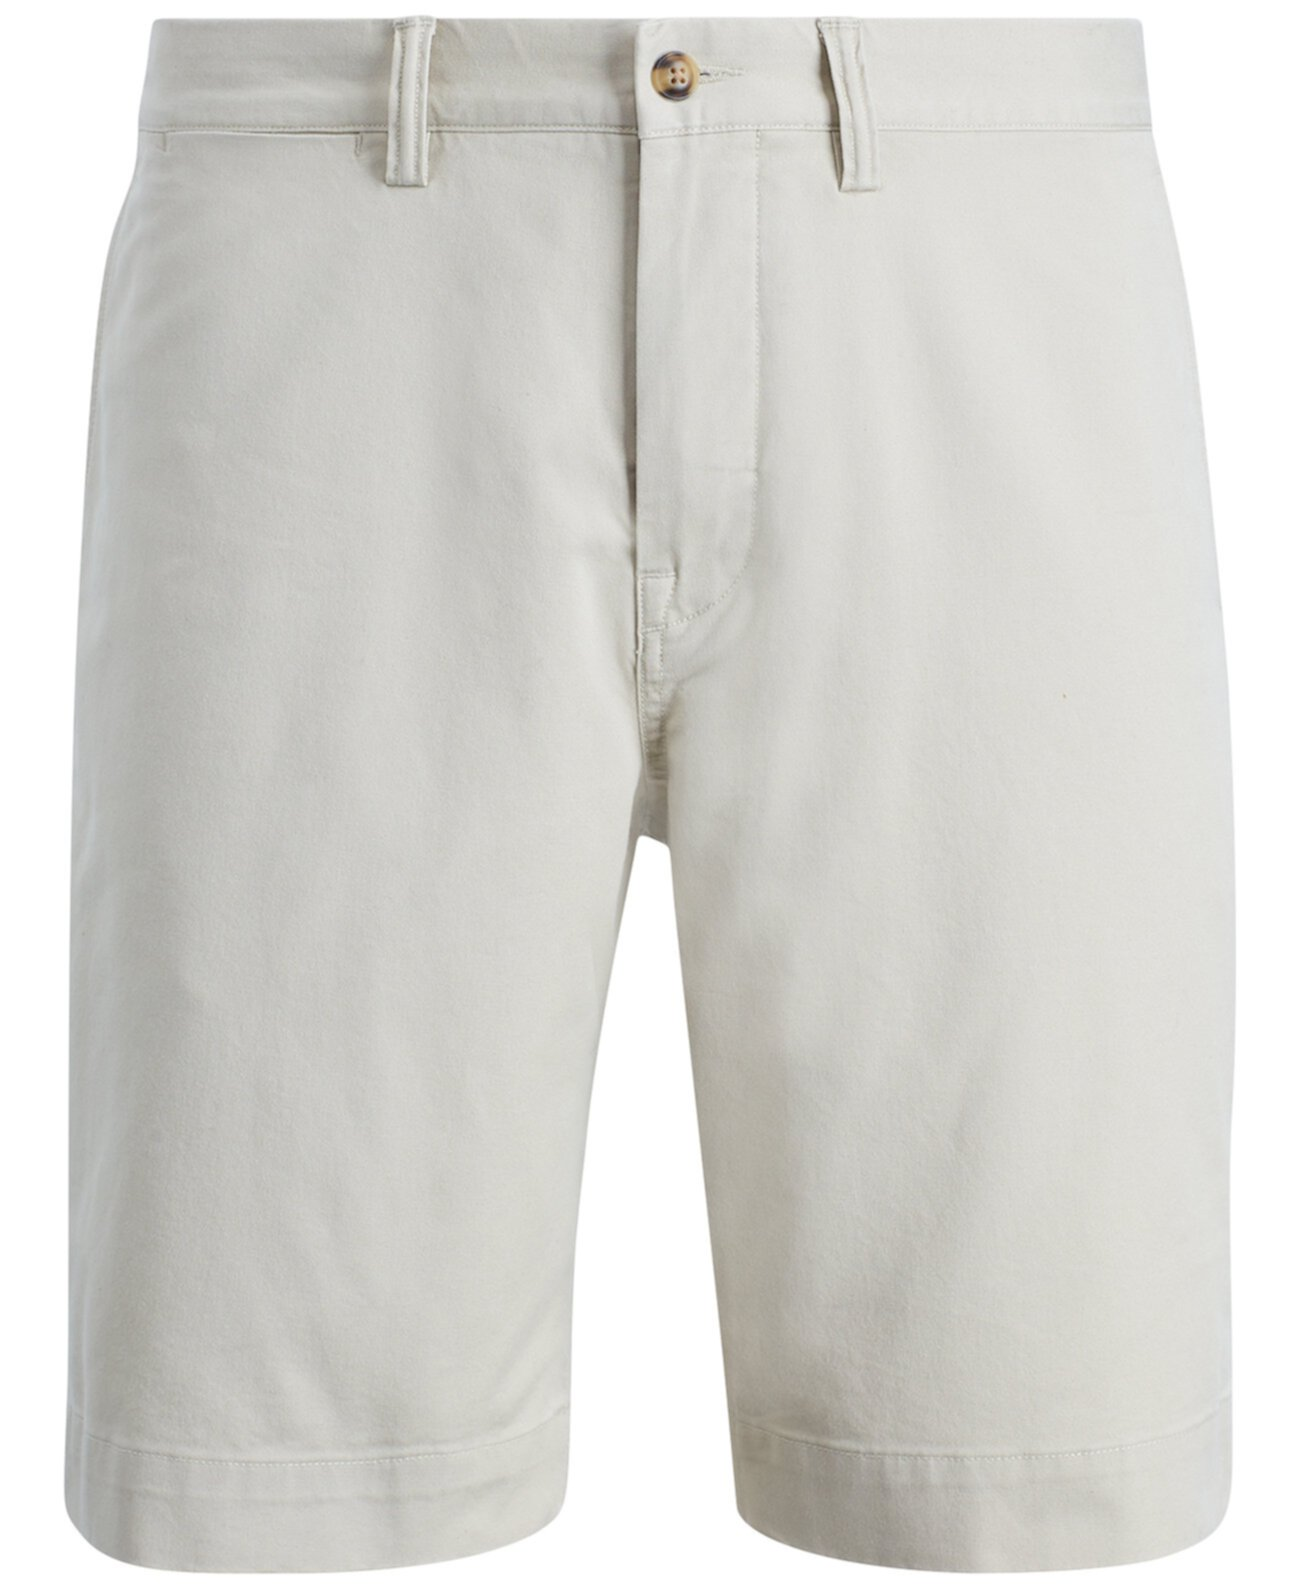 "Мужские эластичные шорты Classic-Fit 9 "" Ralph Lauren"